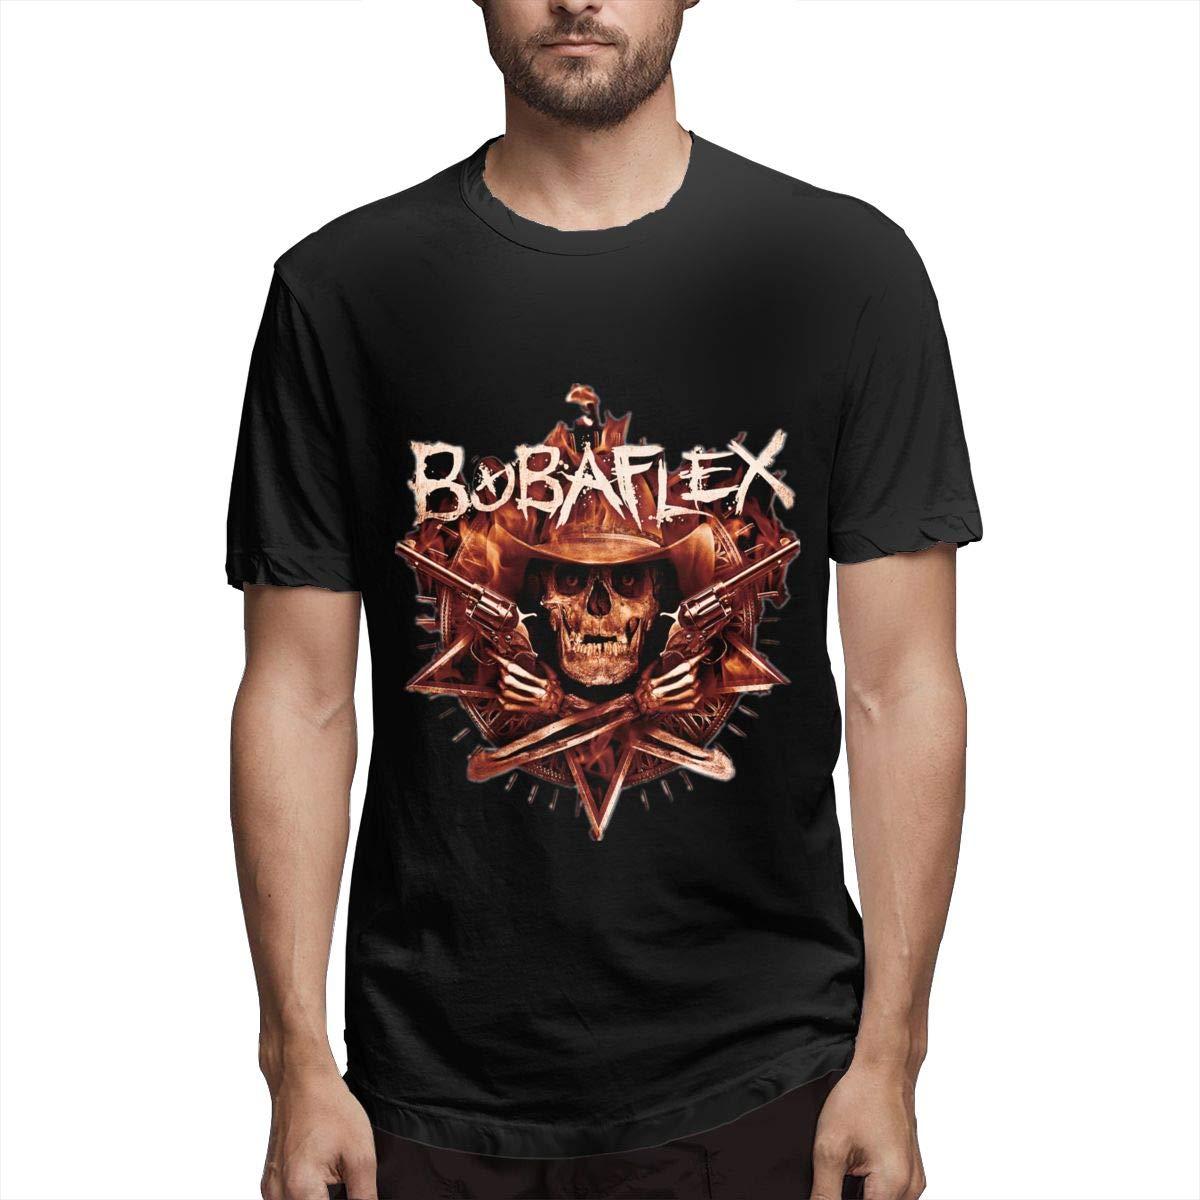 Lihehen Mans Bobaflex Retro Printing Round Neck Tees Shirts